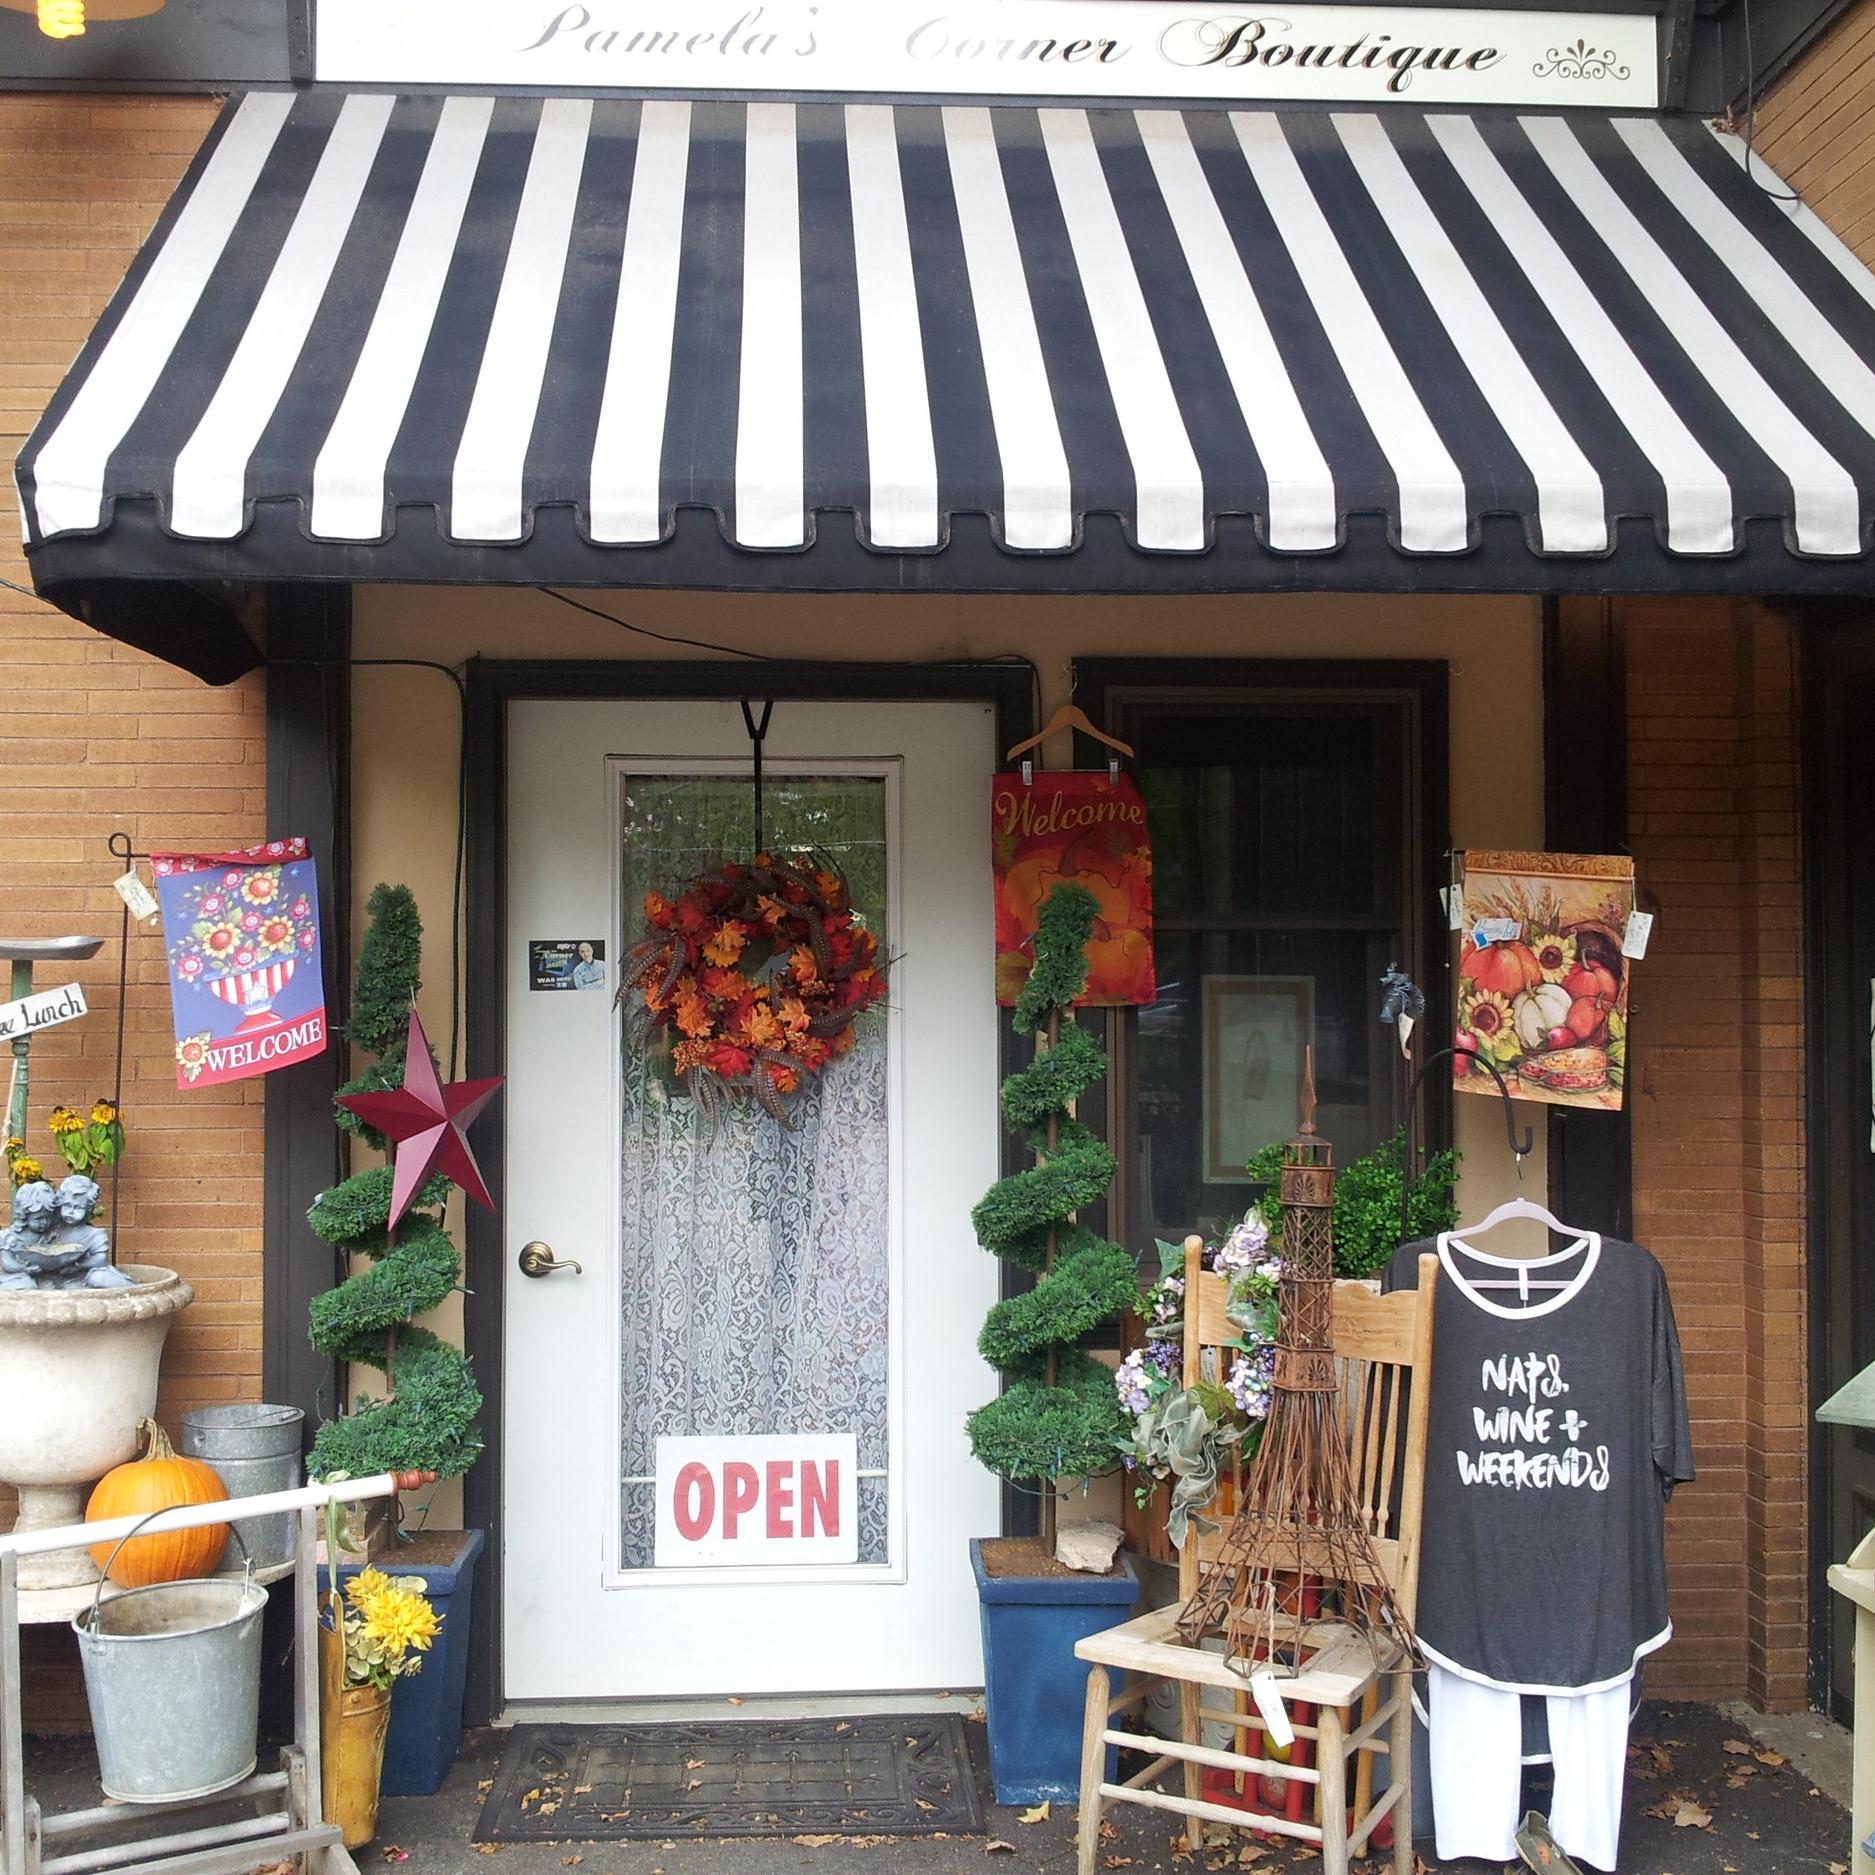 Pamela's Corner Boutique.jpg